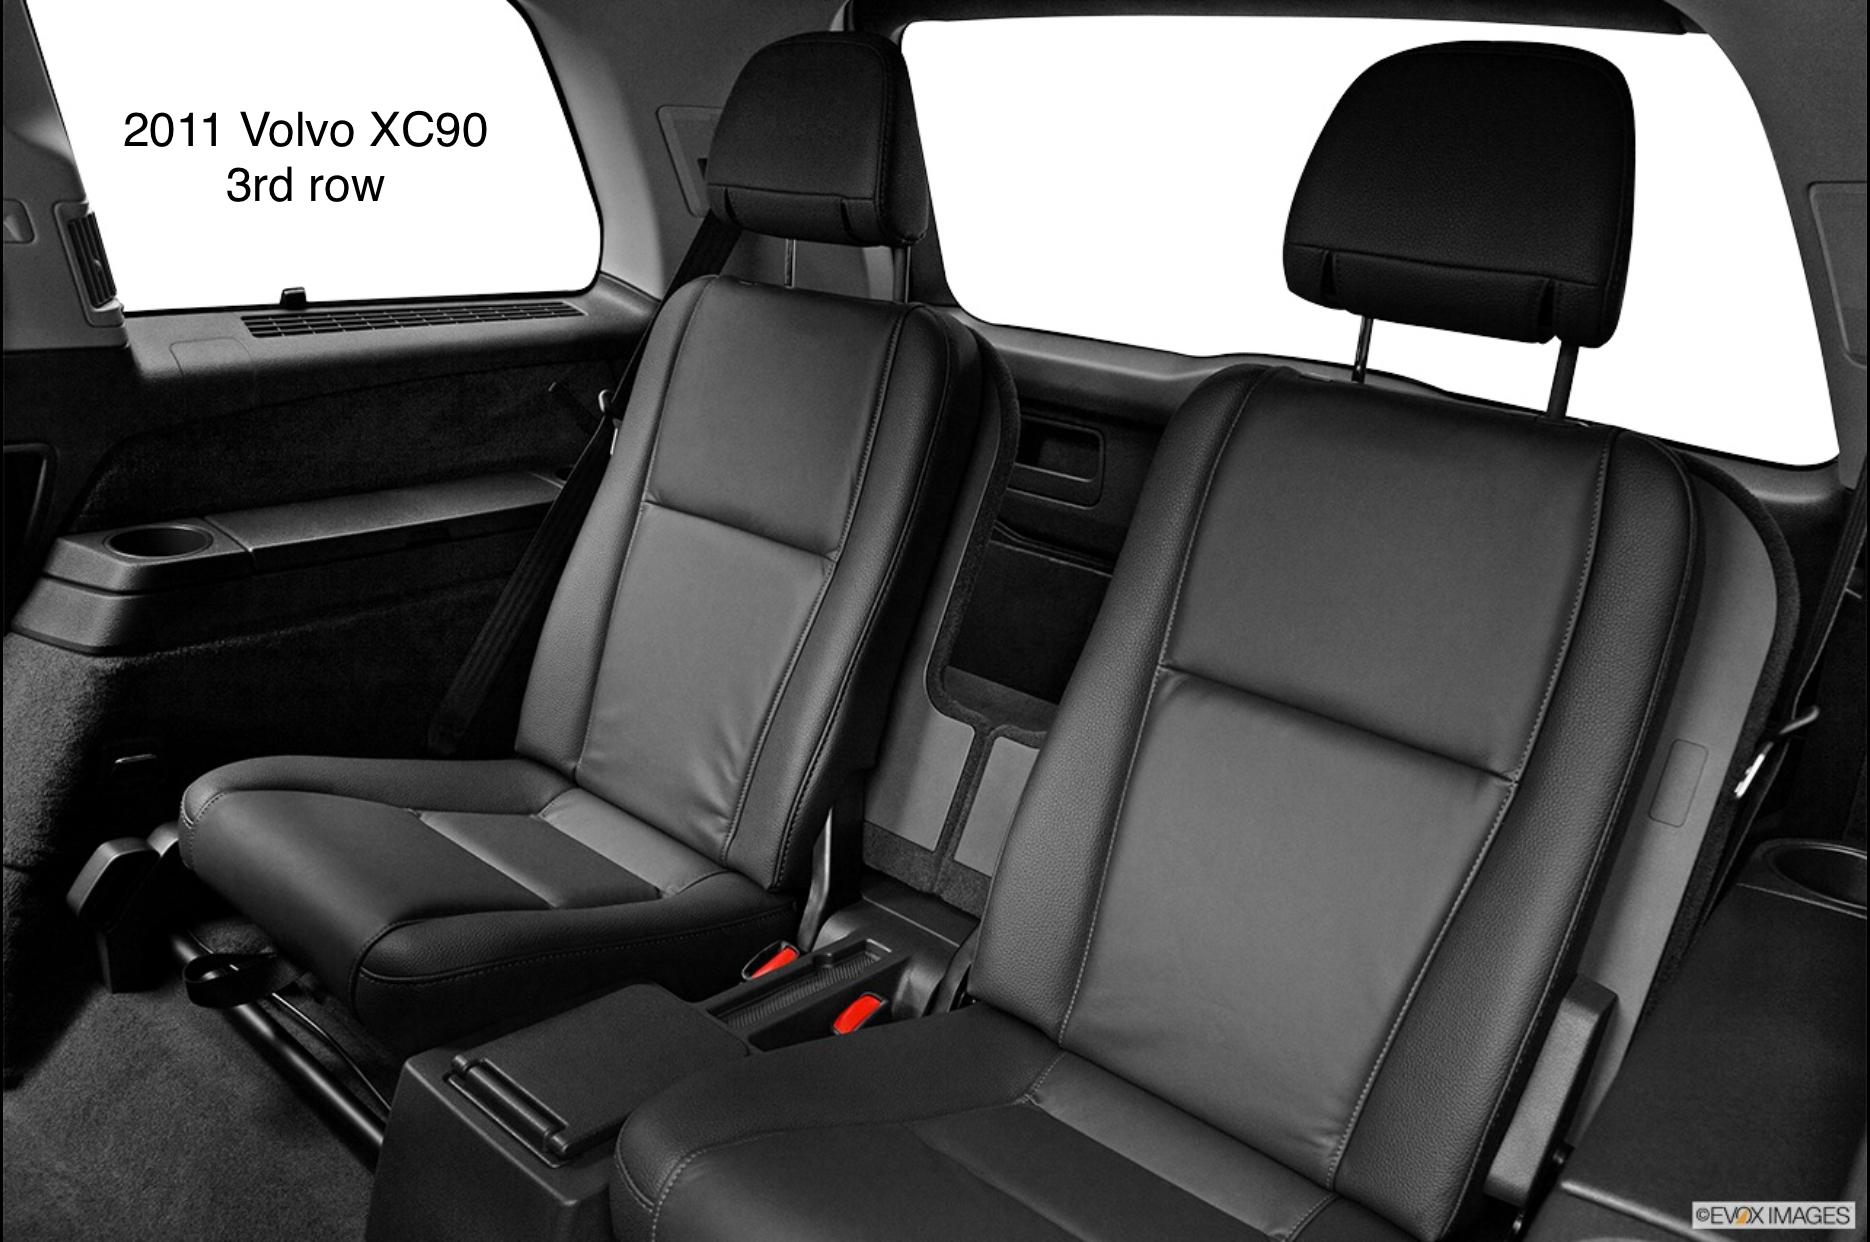 The Car Seat Ladyvolvo Xc90 The Car Seat Lady